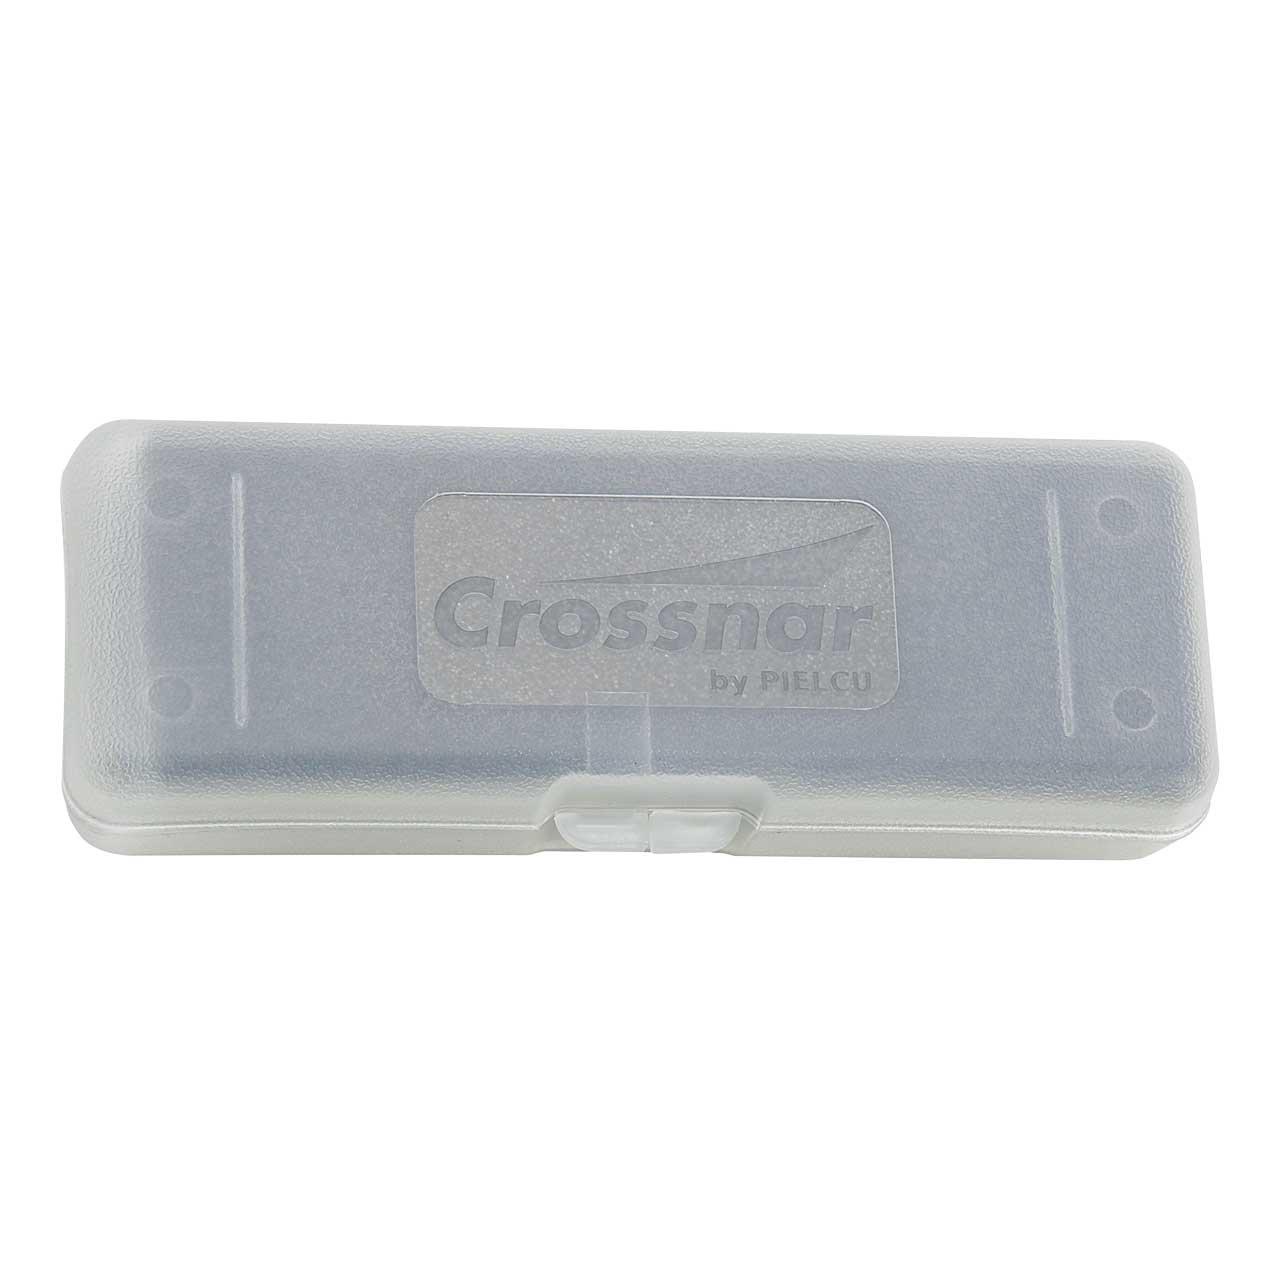 Rettungsmesser, Stahl AISI 420, Liner Lock,